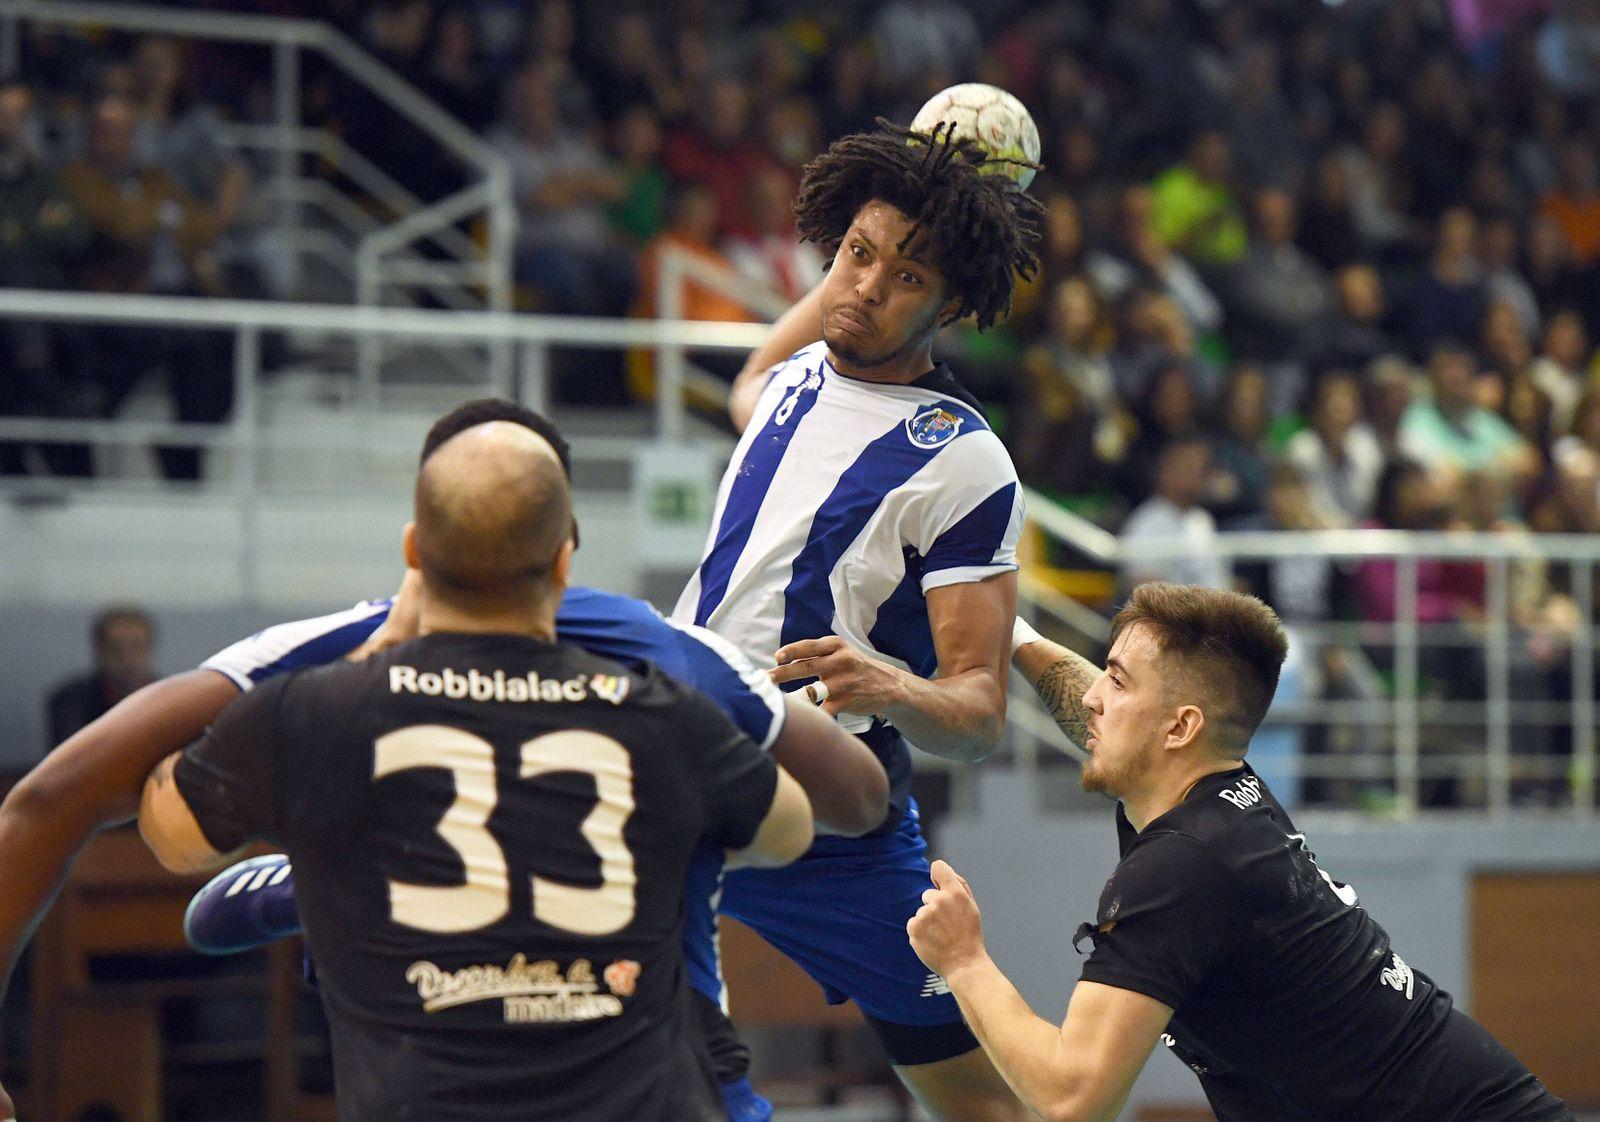 Madeira SAD FC Porto Funchal 28 03 2018 Handball National final phase match 2 of anticipate